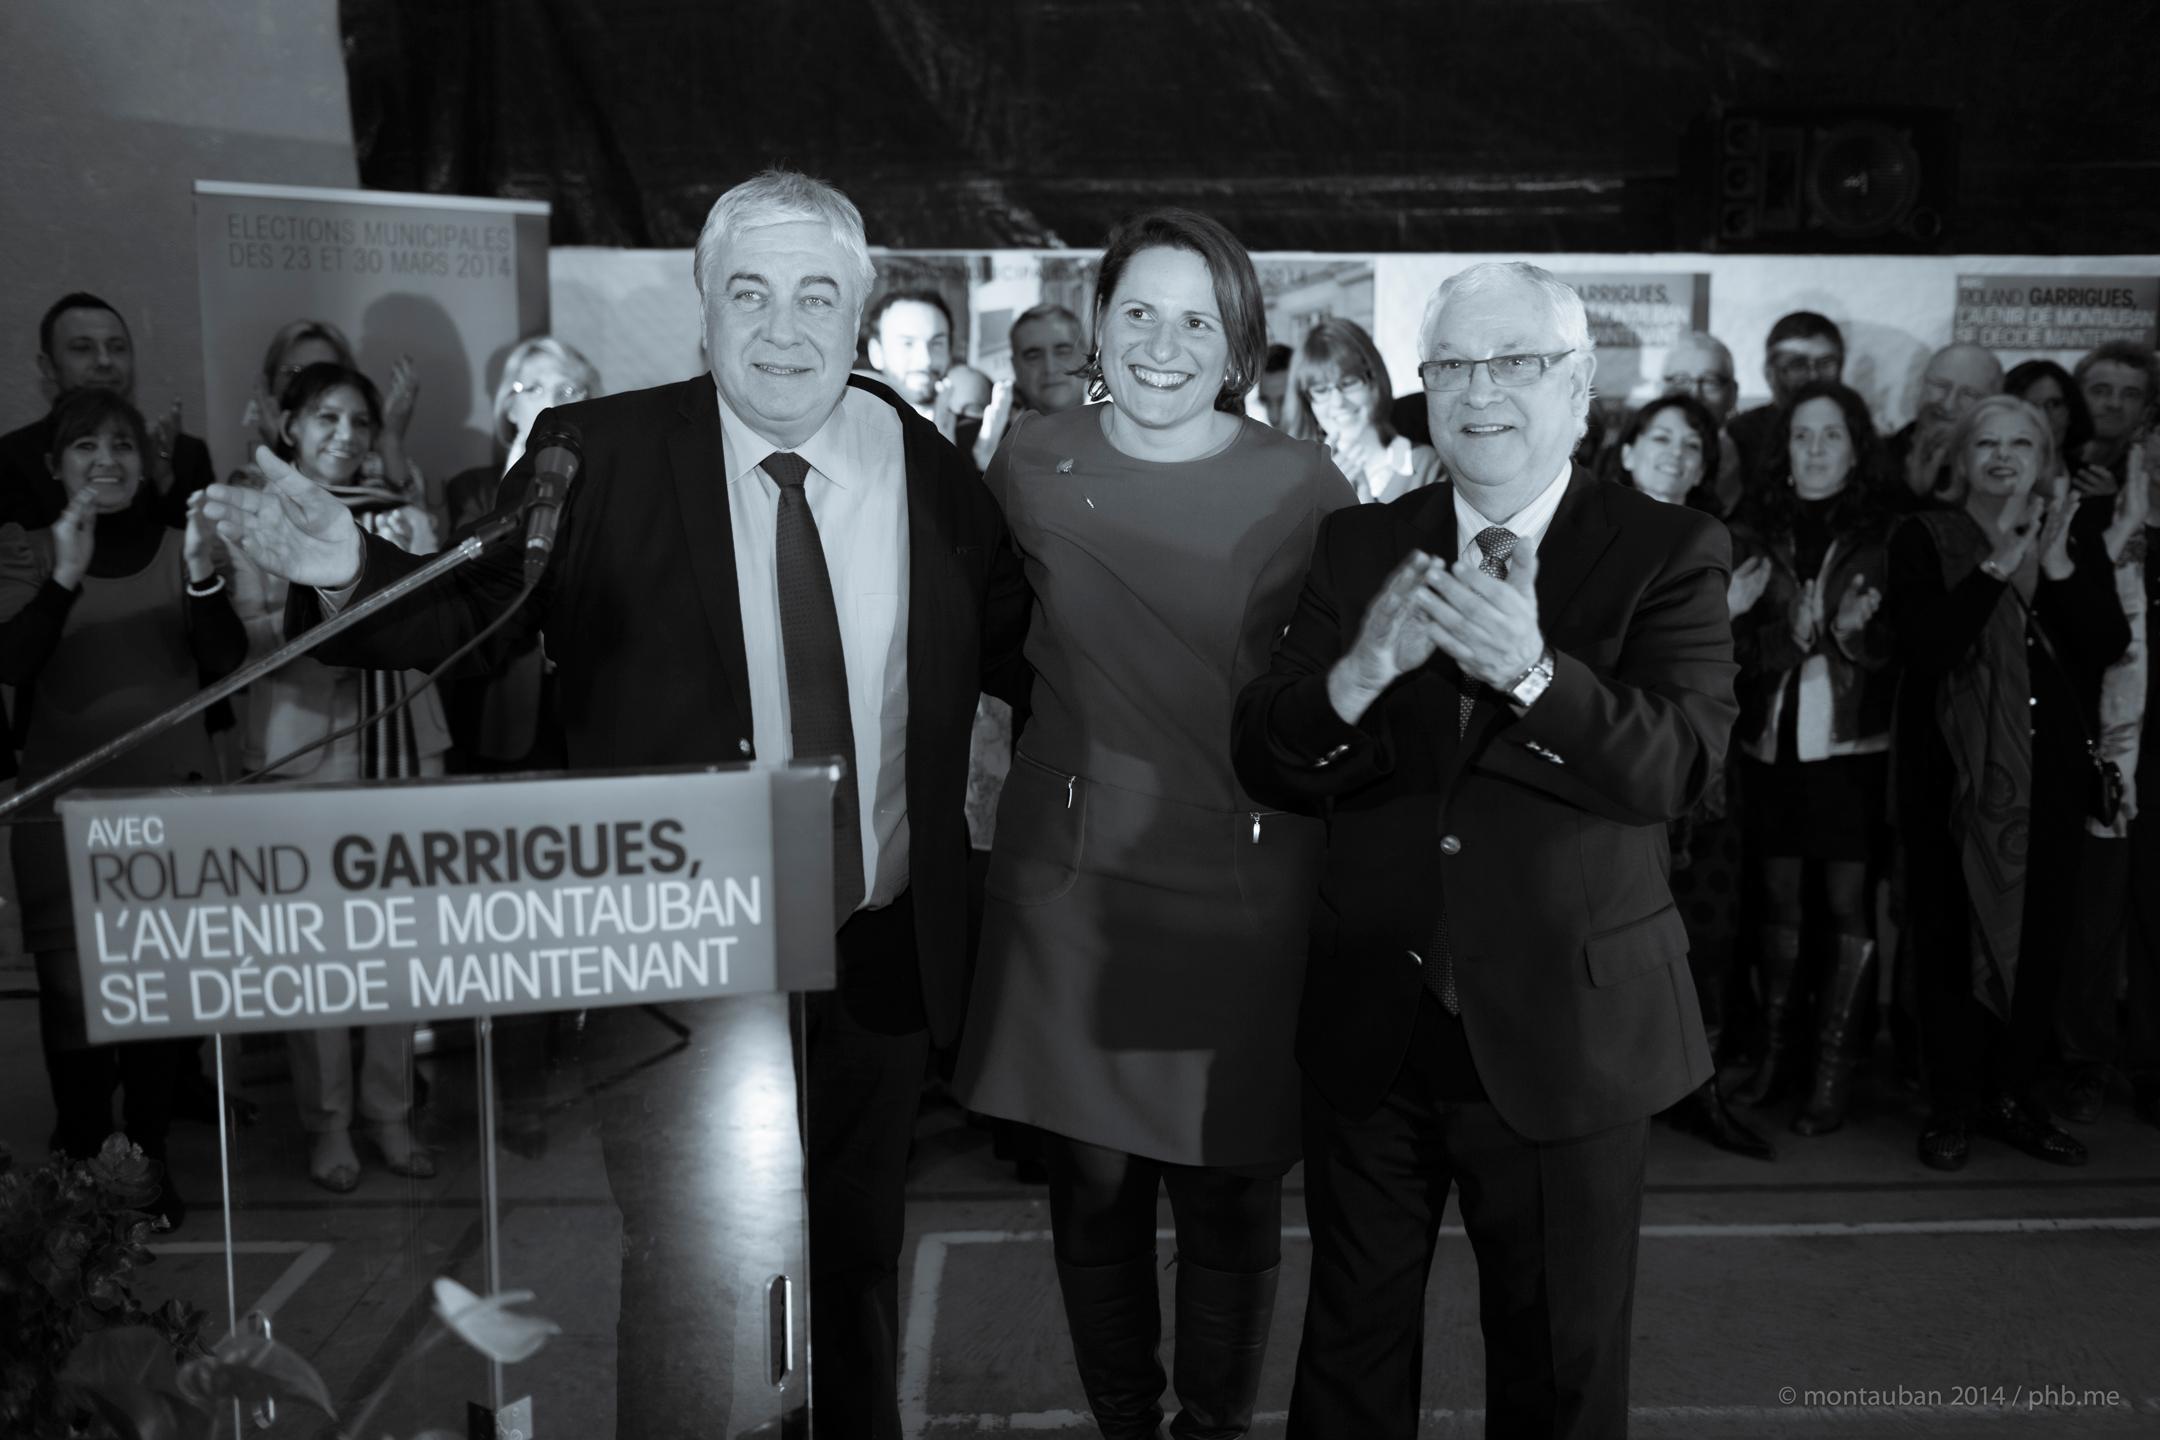 Montauban-2014-Roland_Garrigues-Liste-IMG_8169-2